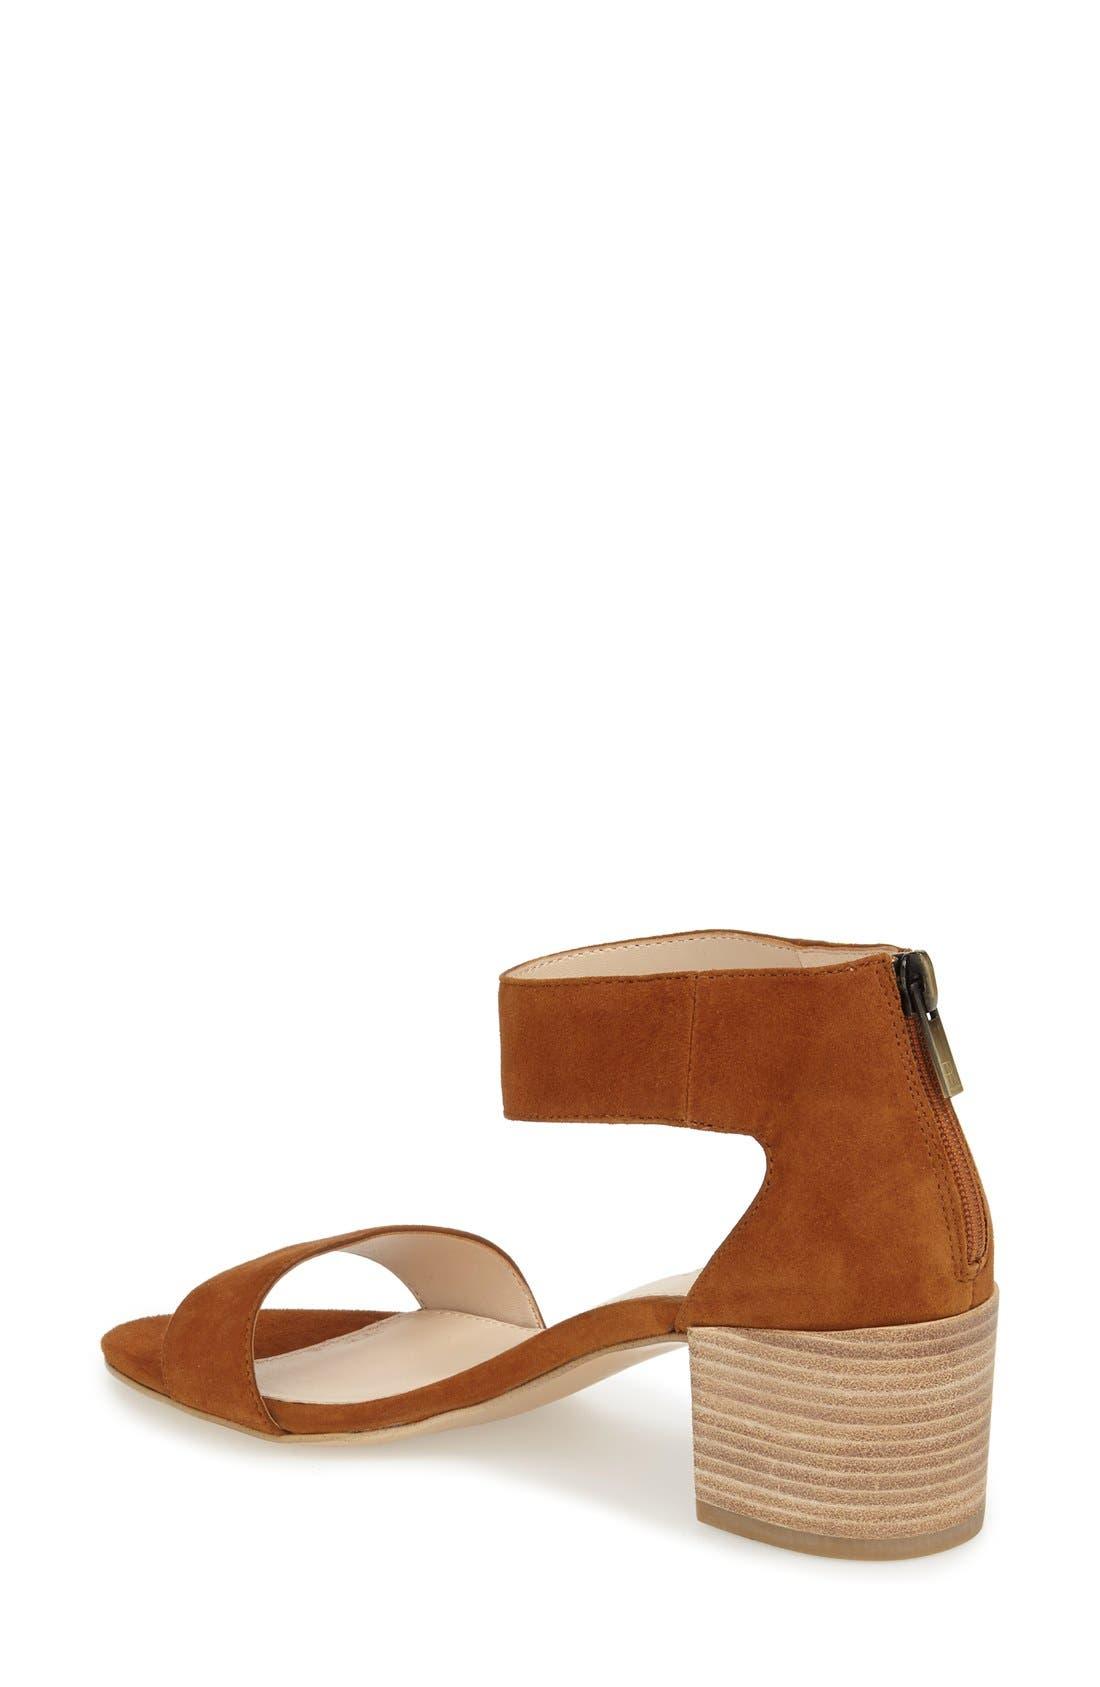 Pella Moda 'Urban' Block Heel Sandal,                             Alternate thumbnail 5, color,